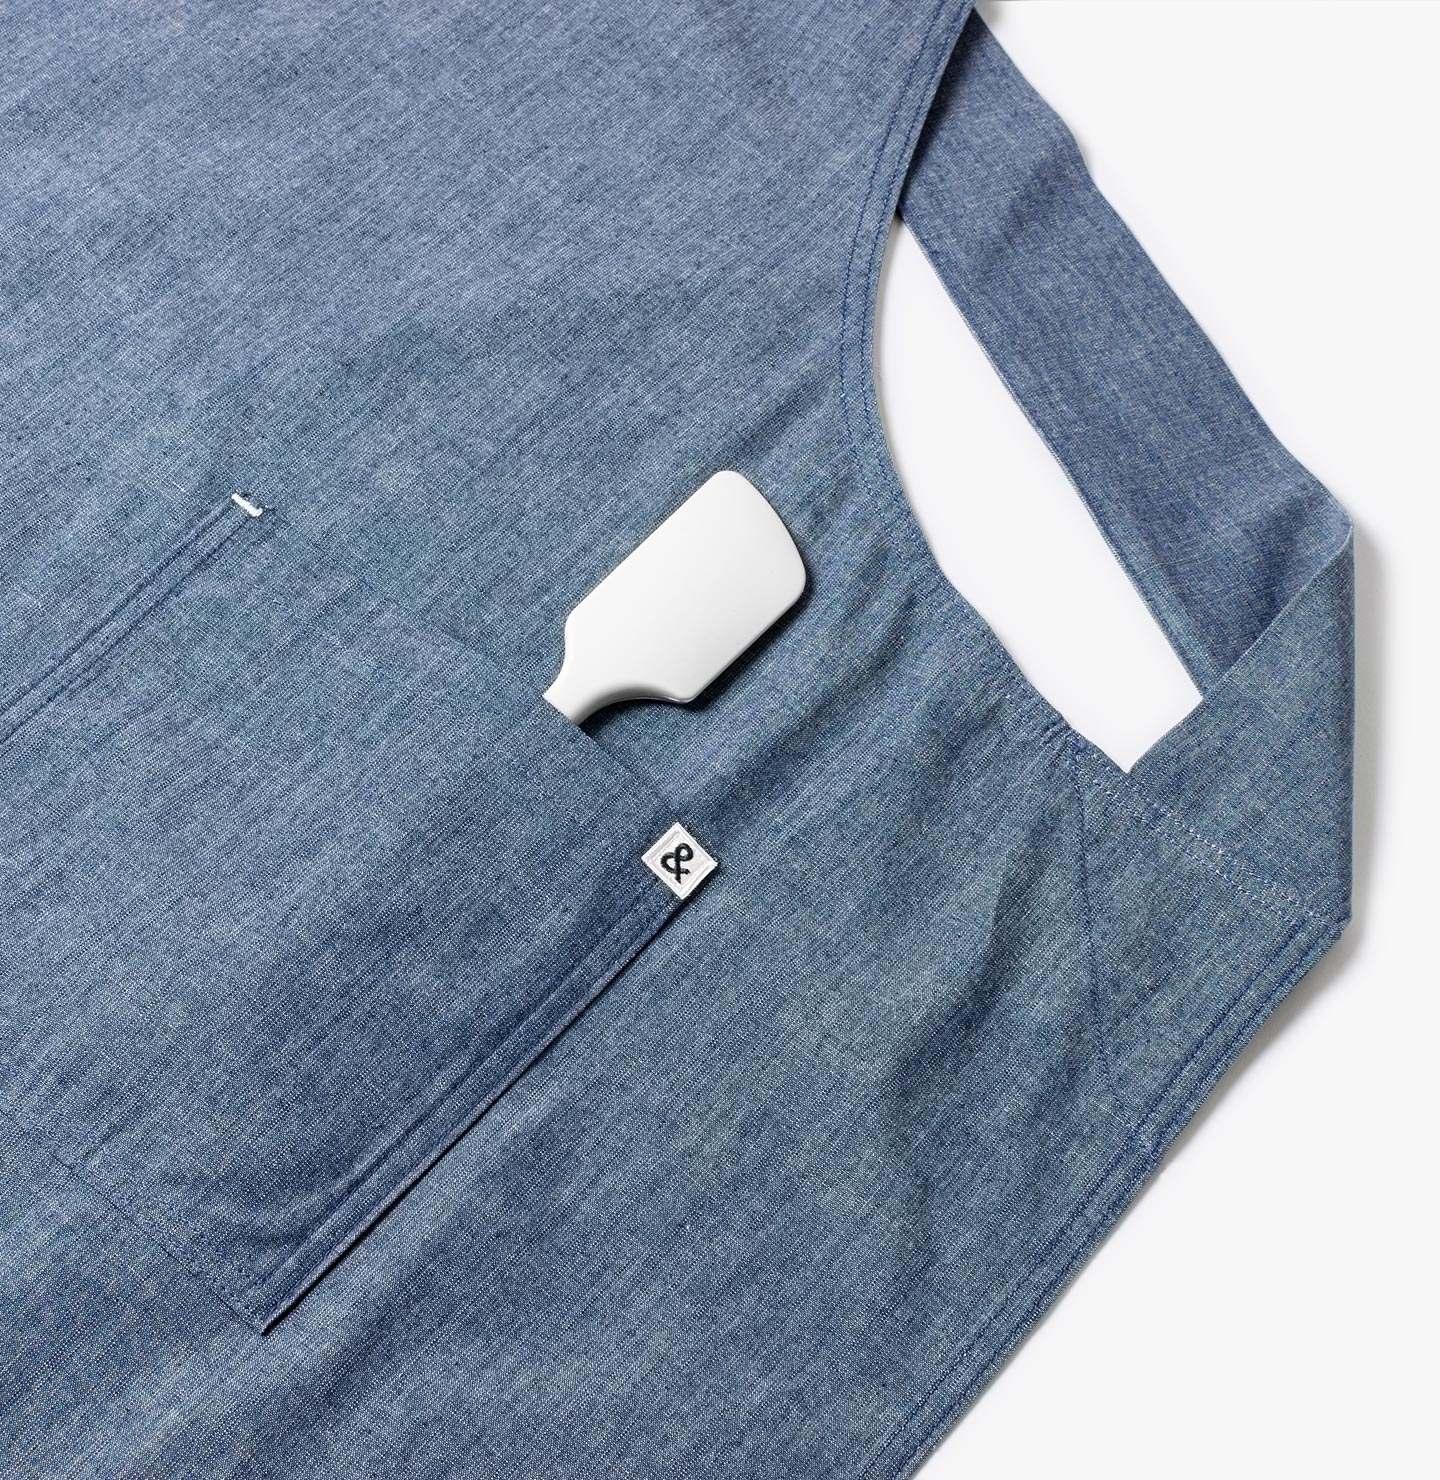 Square Lap Pockets